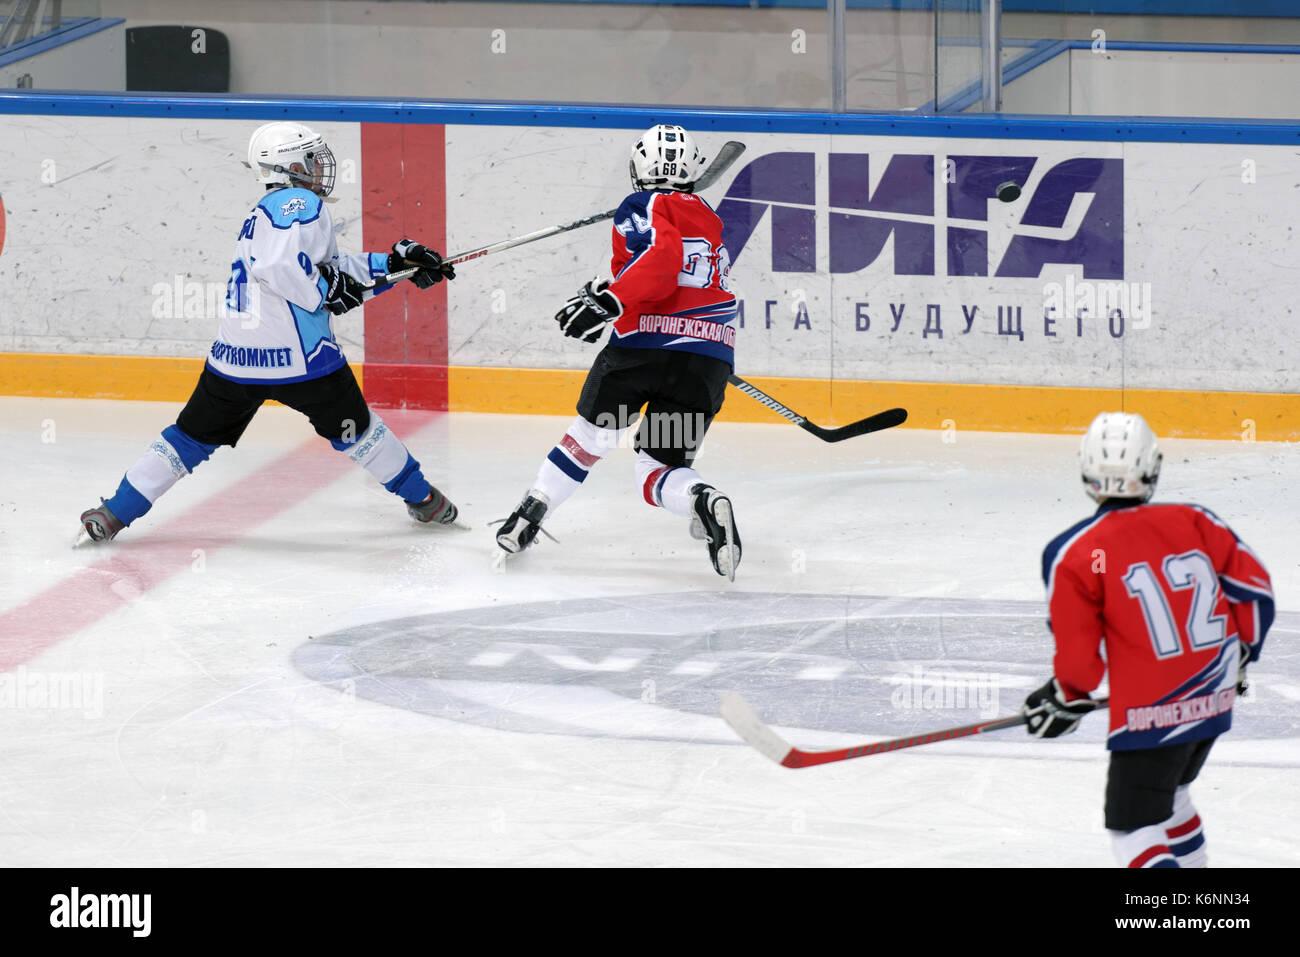 St. Petersburg, Russia - March 25, 2016: Ice hockey match Bobrov vs